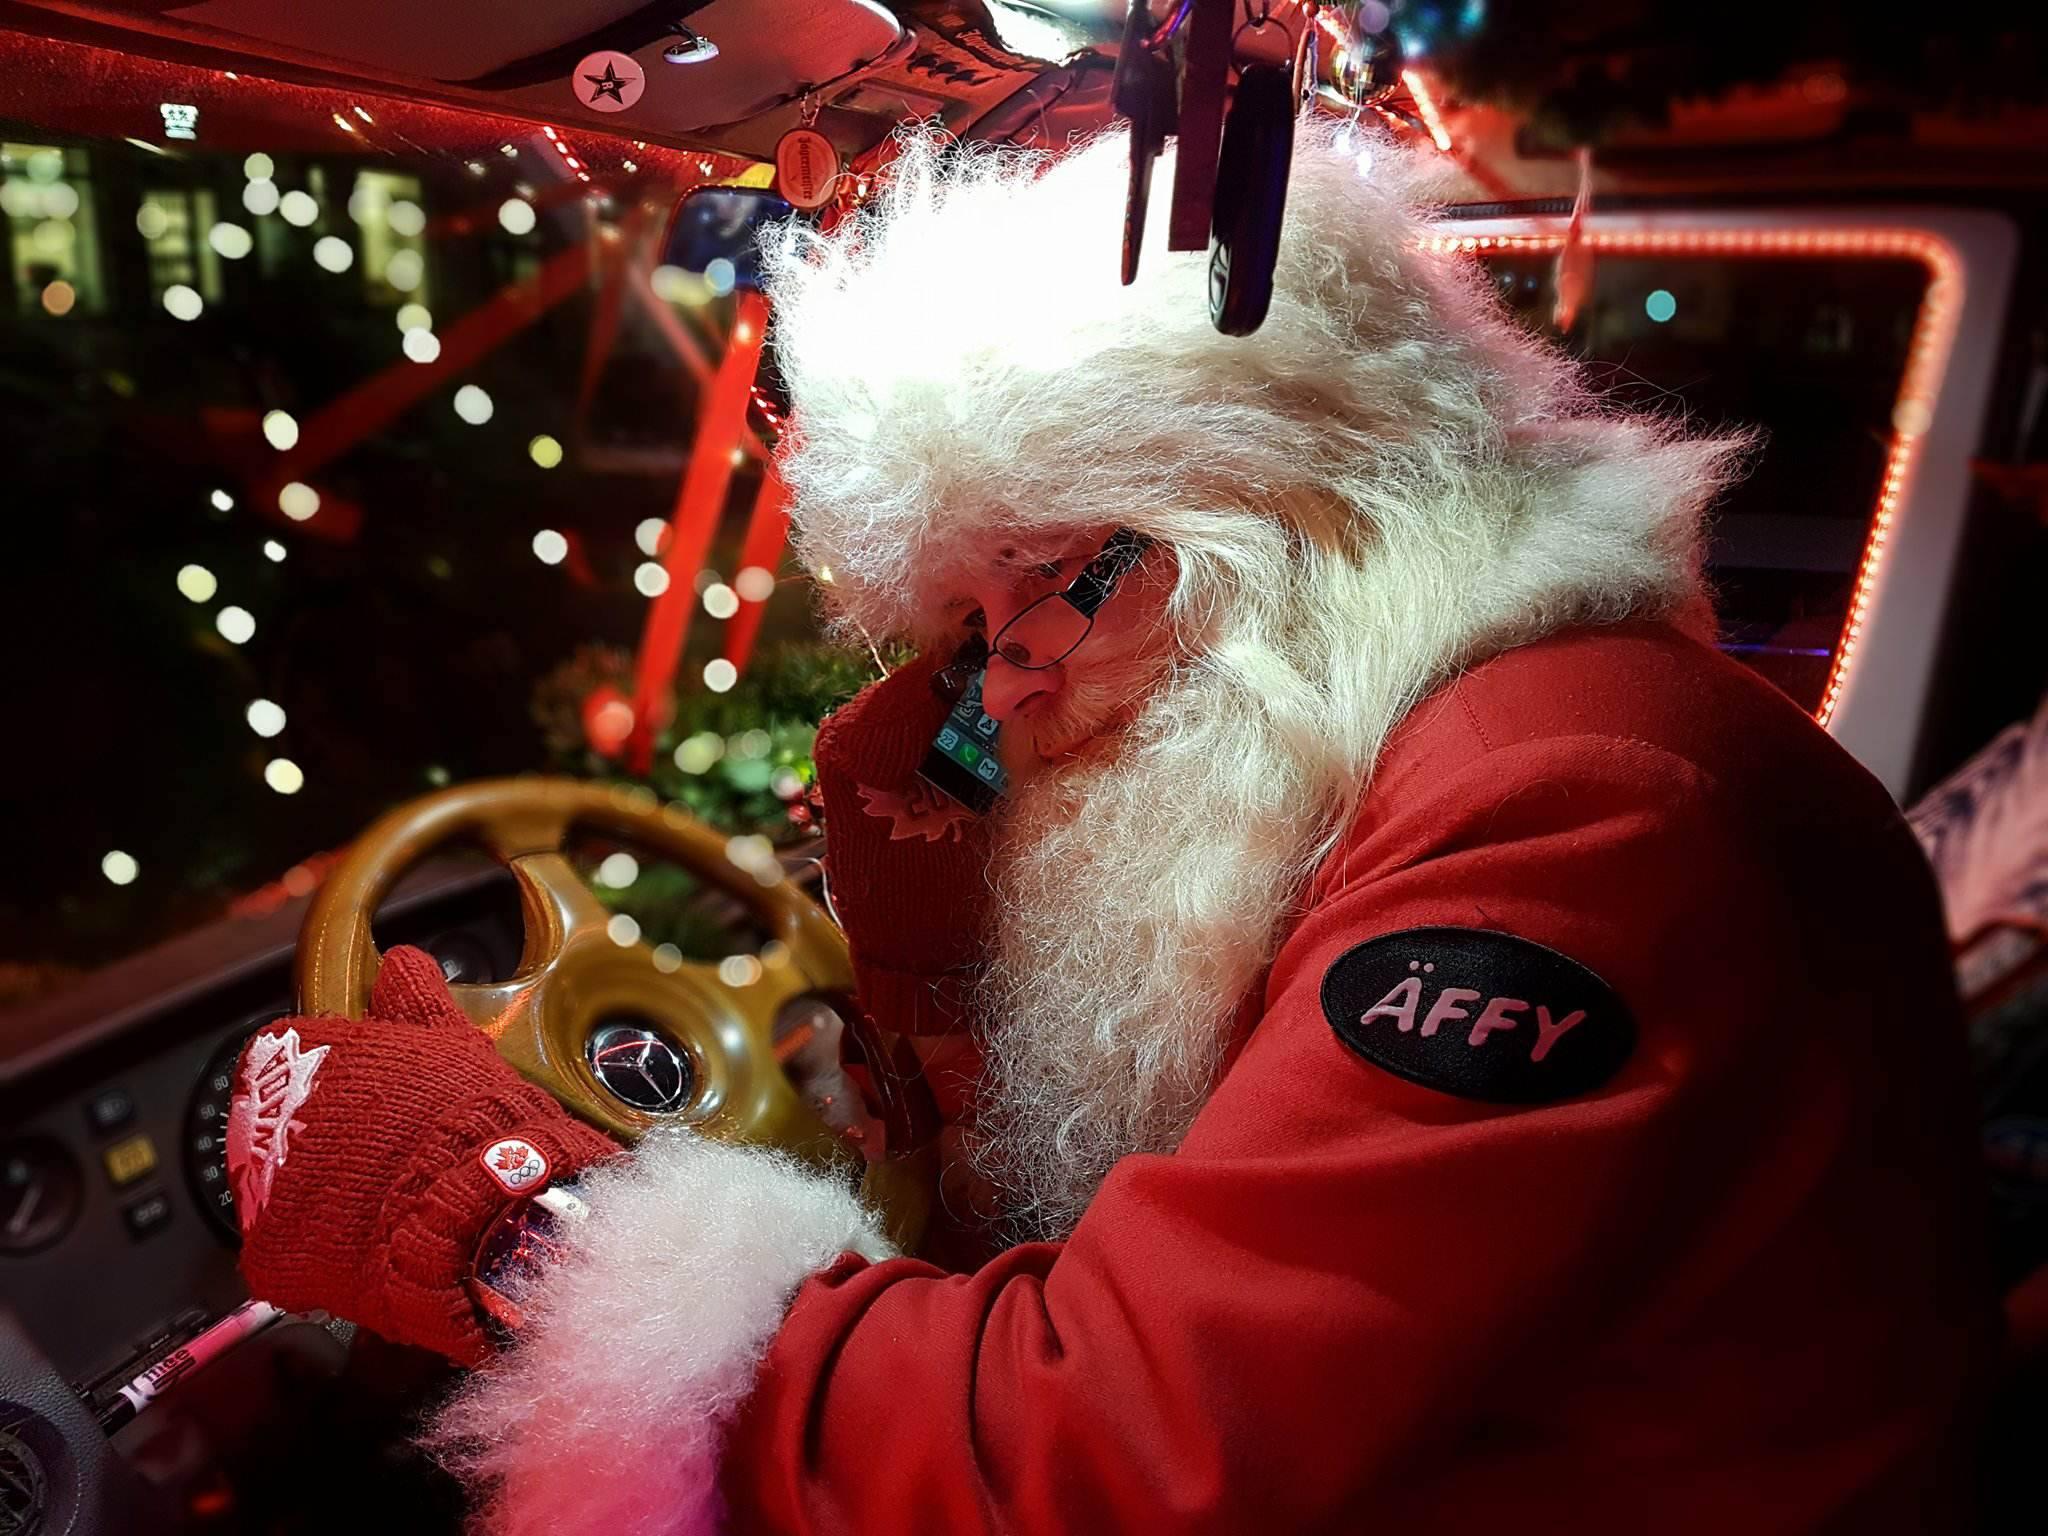 VAHVA! Vaata, millist ilma ennustab jõuluvana Äffy